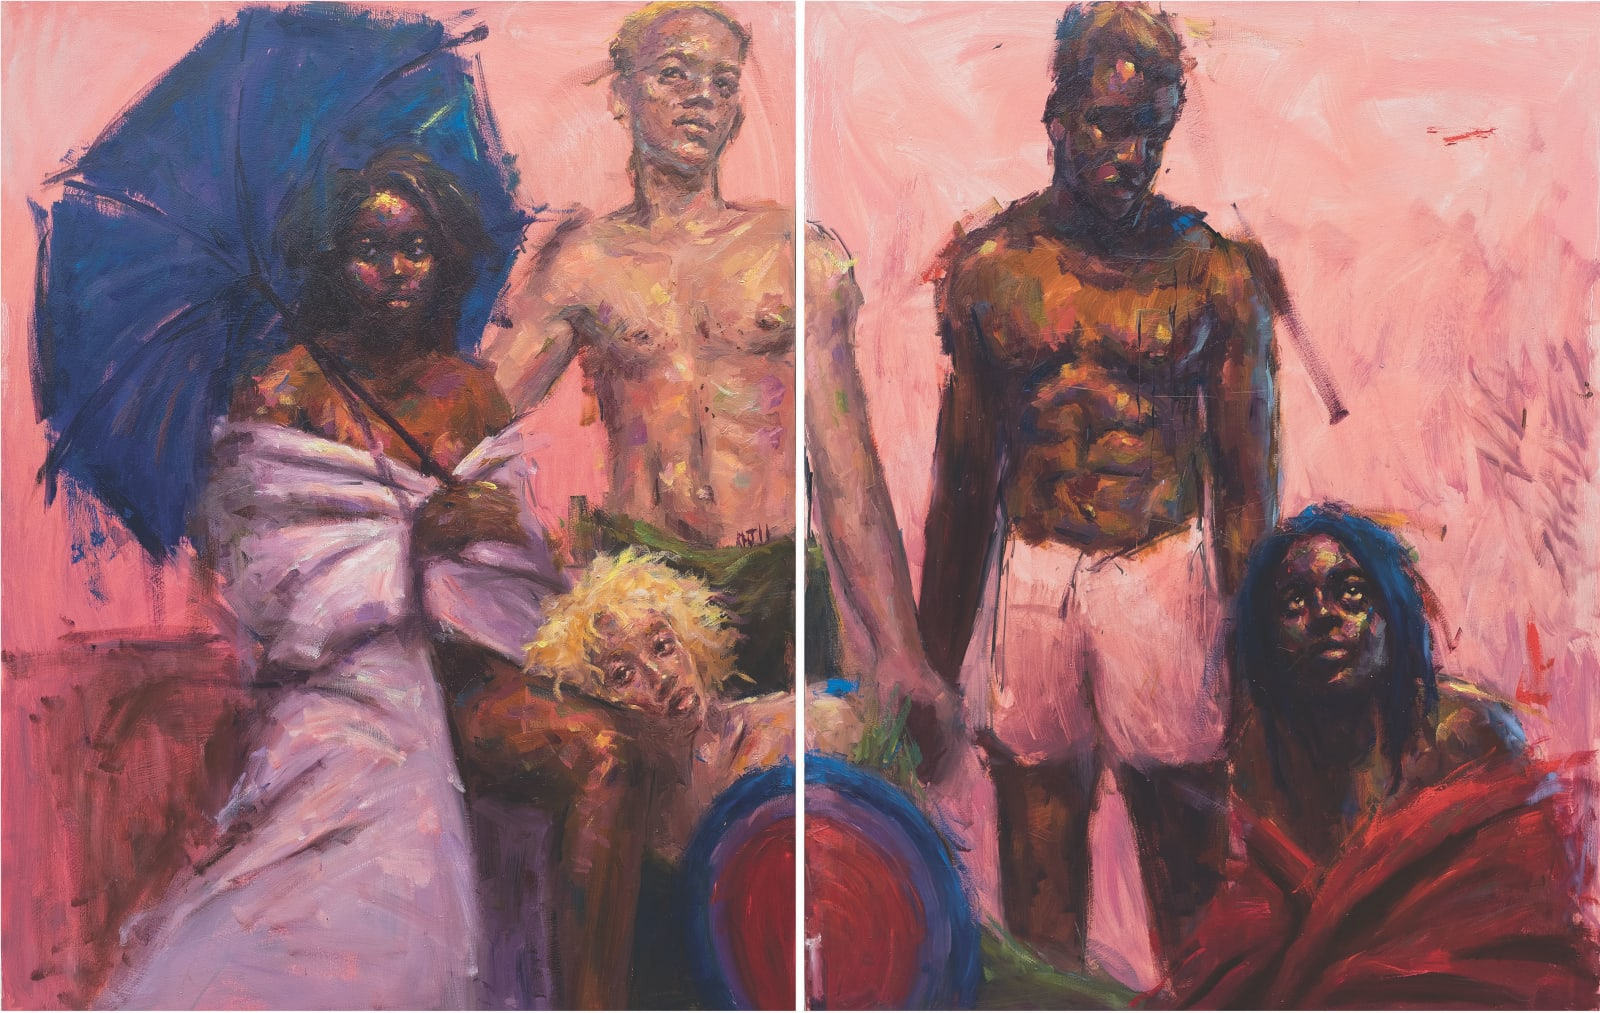 Chigozie Obi, Shades of Black V, Diptych, 2020